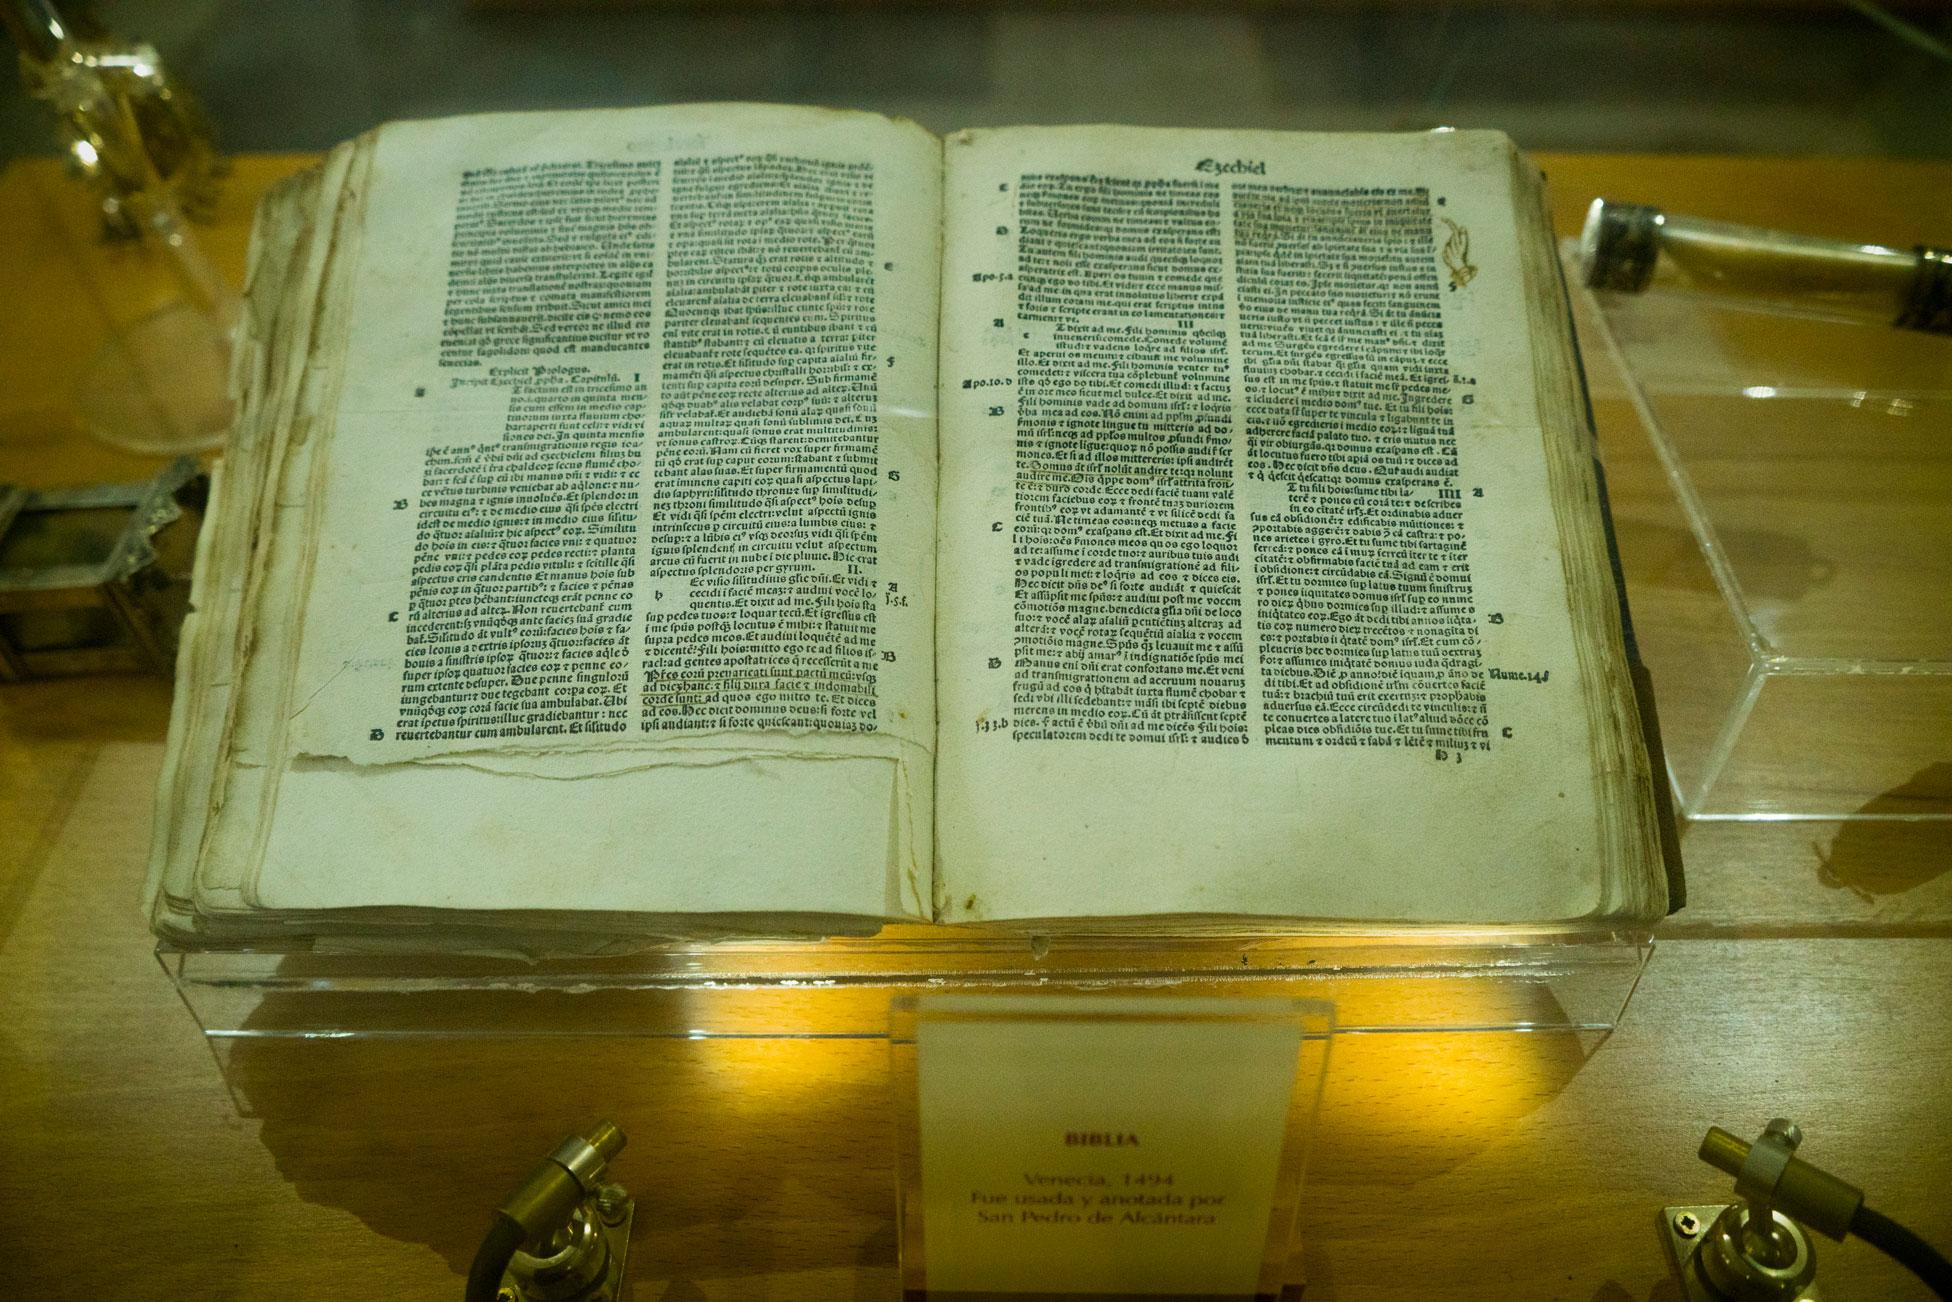 Saint Benito's personal Bible